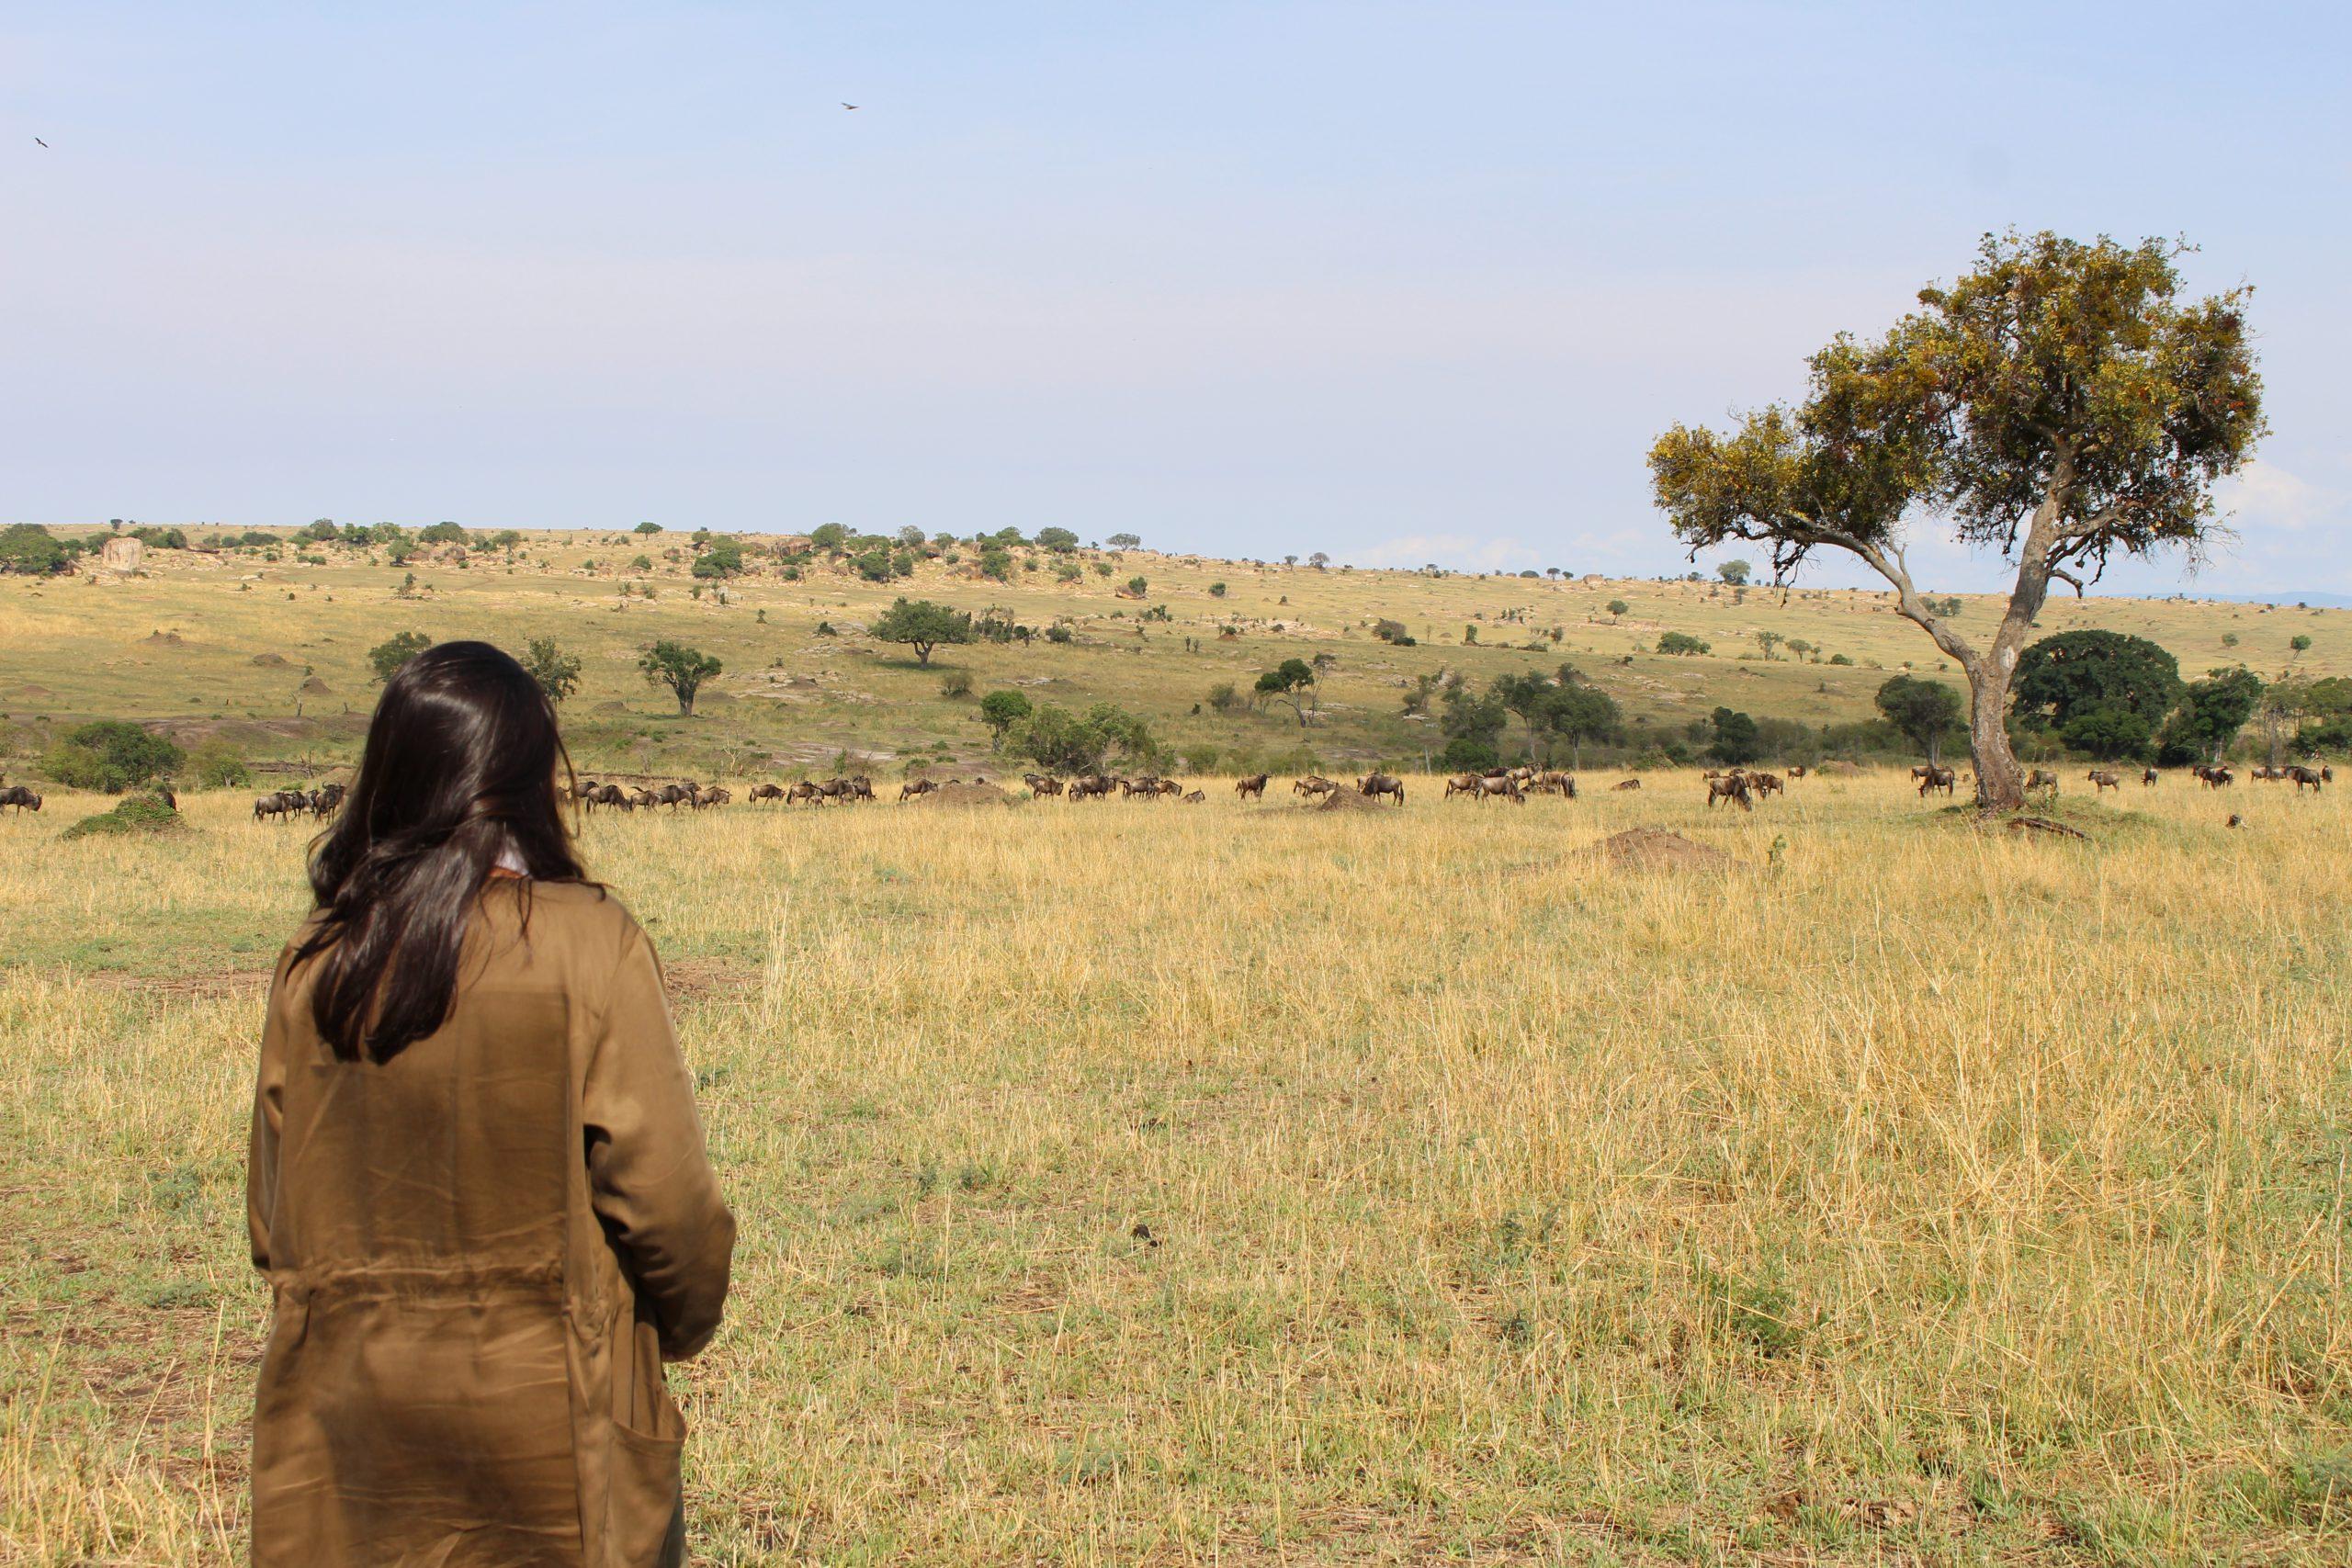 grande_migraca_serengeti